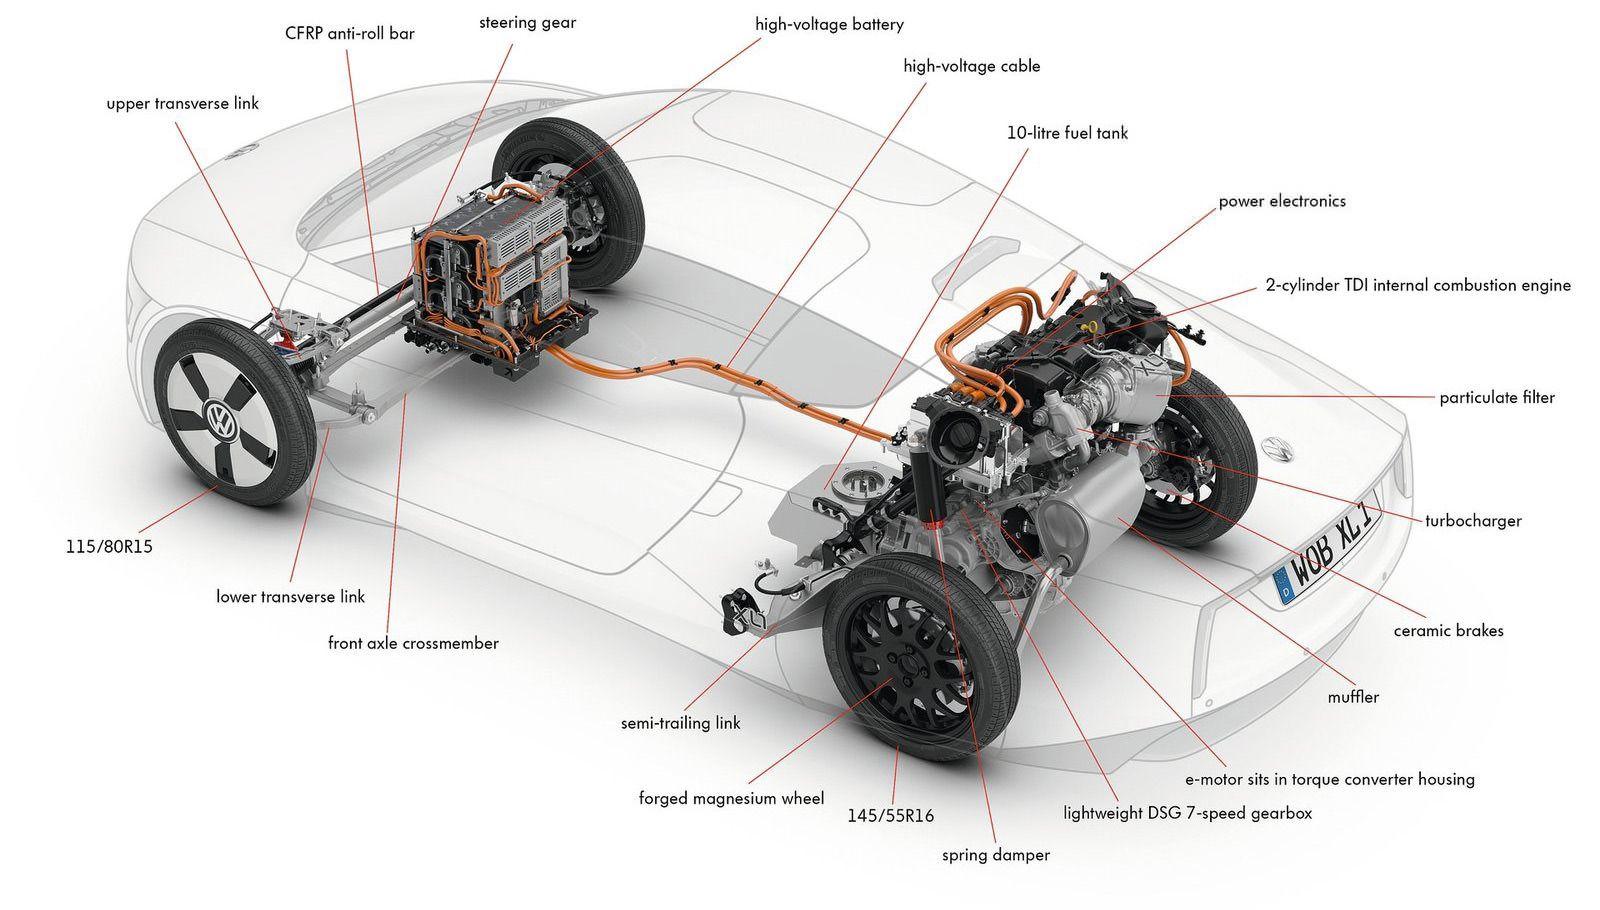 Volkswagen Xl1 Best Hybrid Electric Of 2013 Fuel Efficient Cars